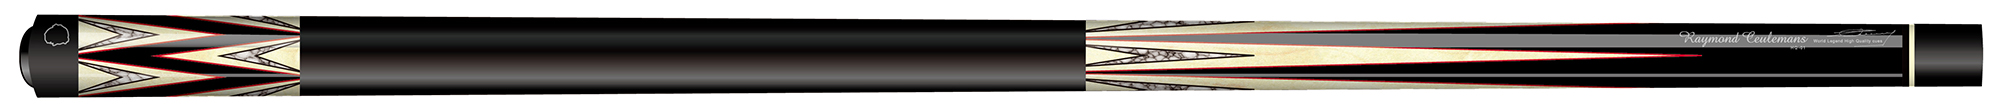 CK0507-1: Raymond Ceulemans ® HQ-WL07 71cm #1